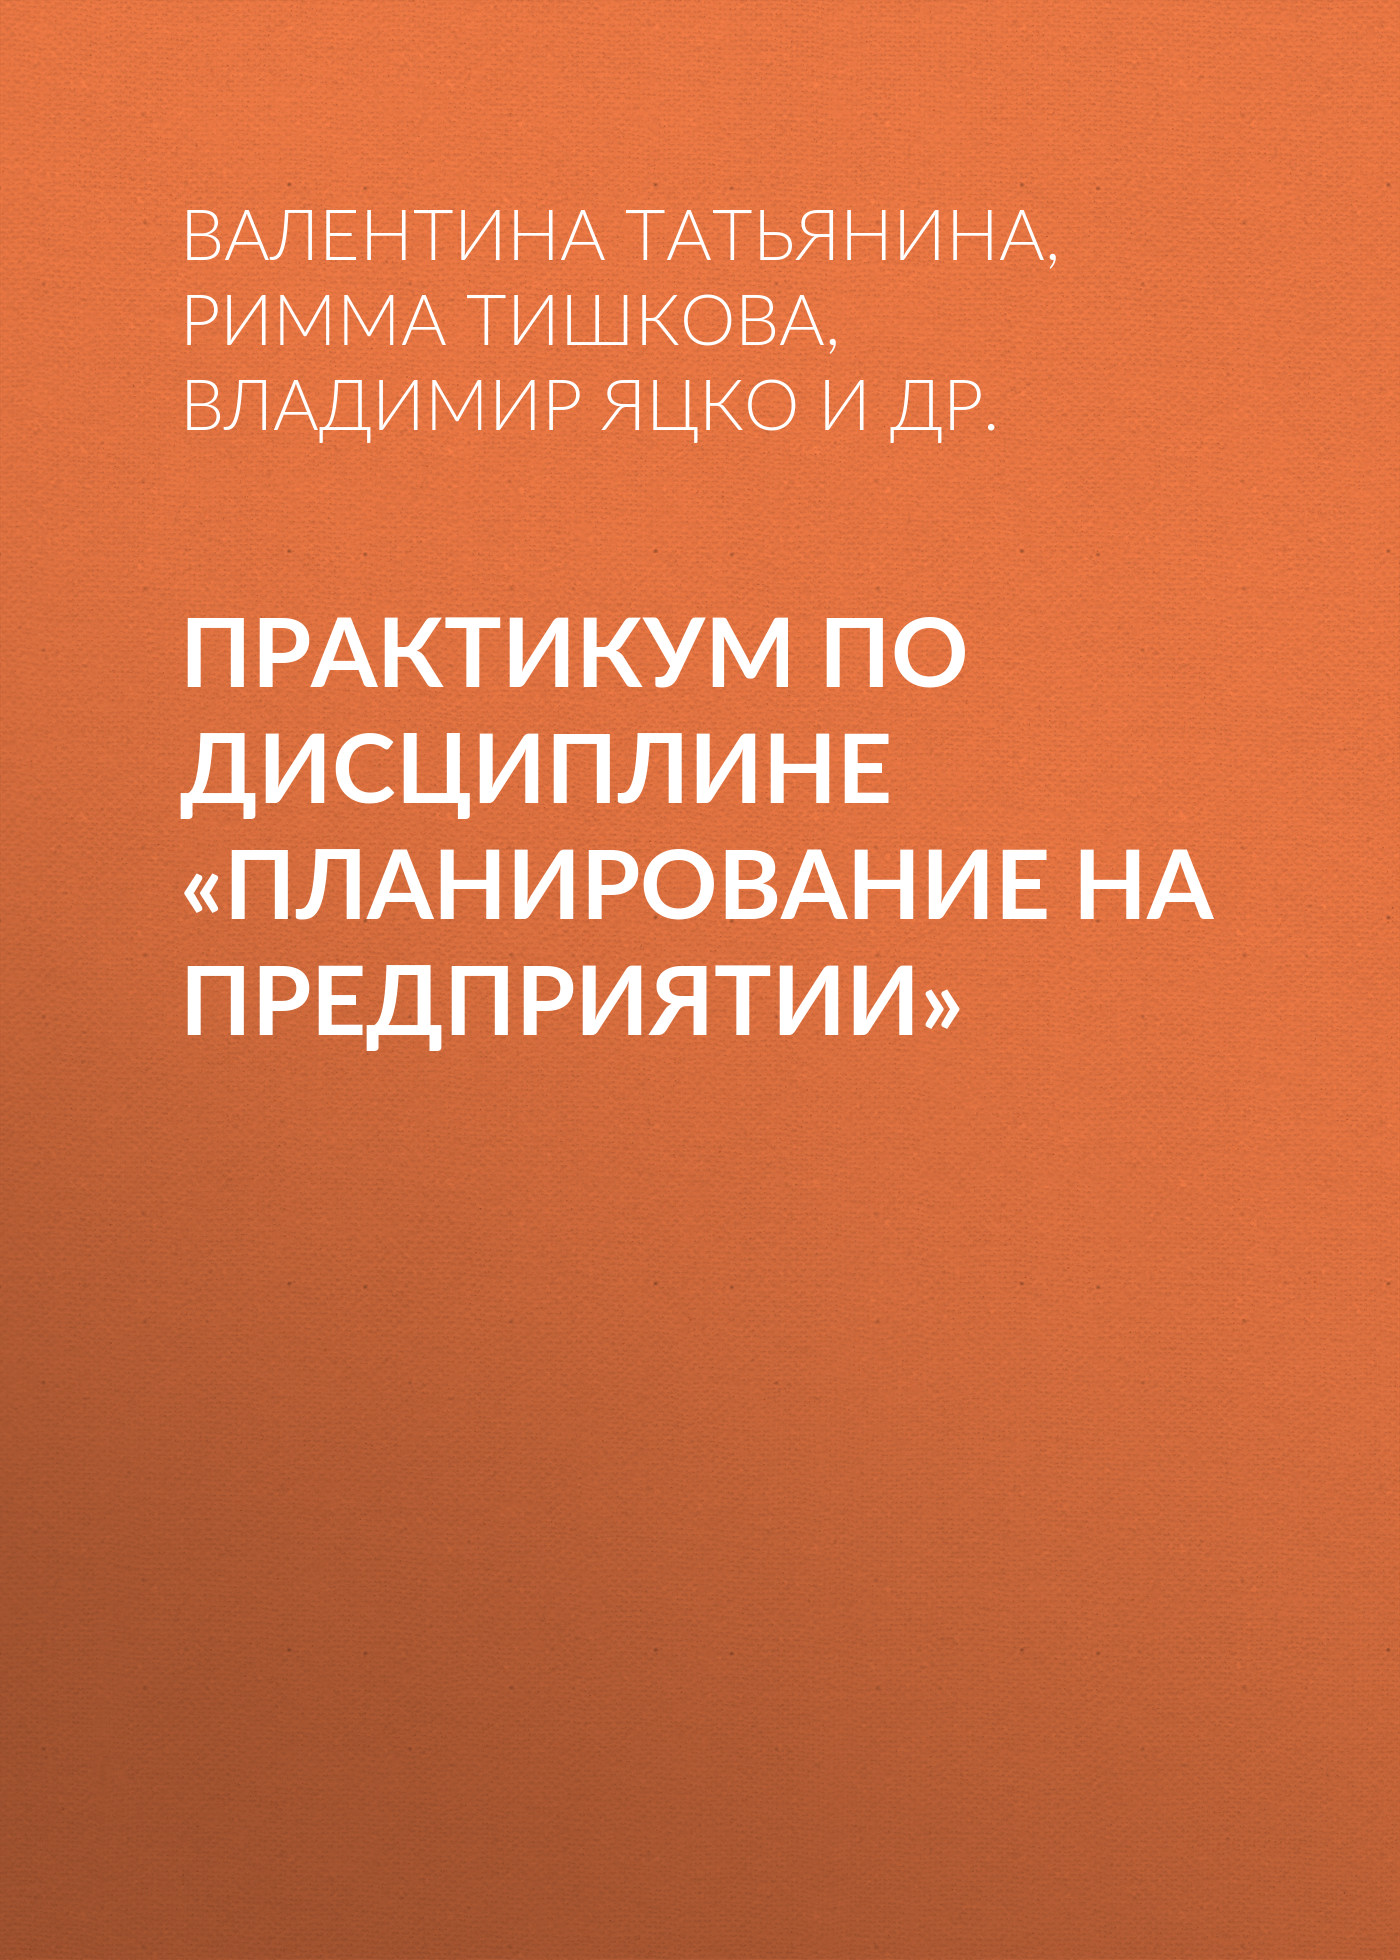 Римма Тишкова Практикум по дисциплине «Планирование на предприятии» с лихтерман планирование на горном предприятии